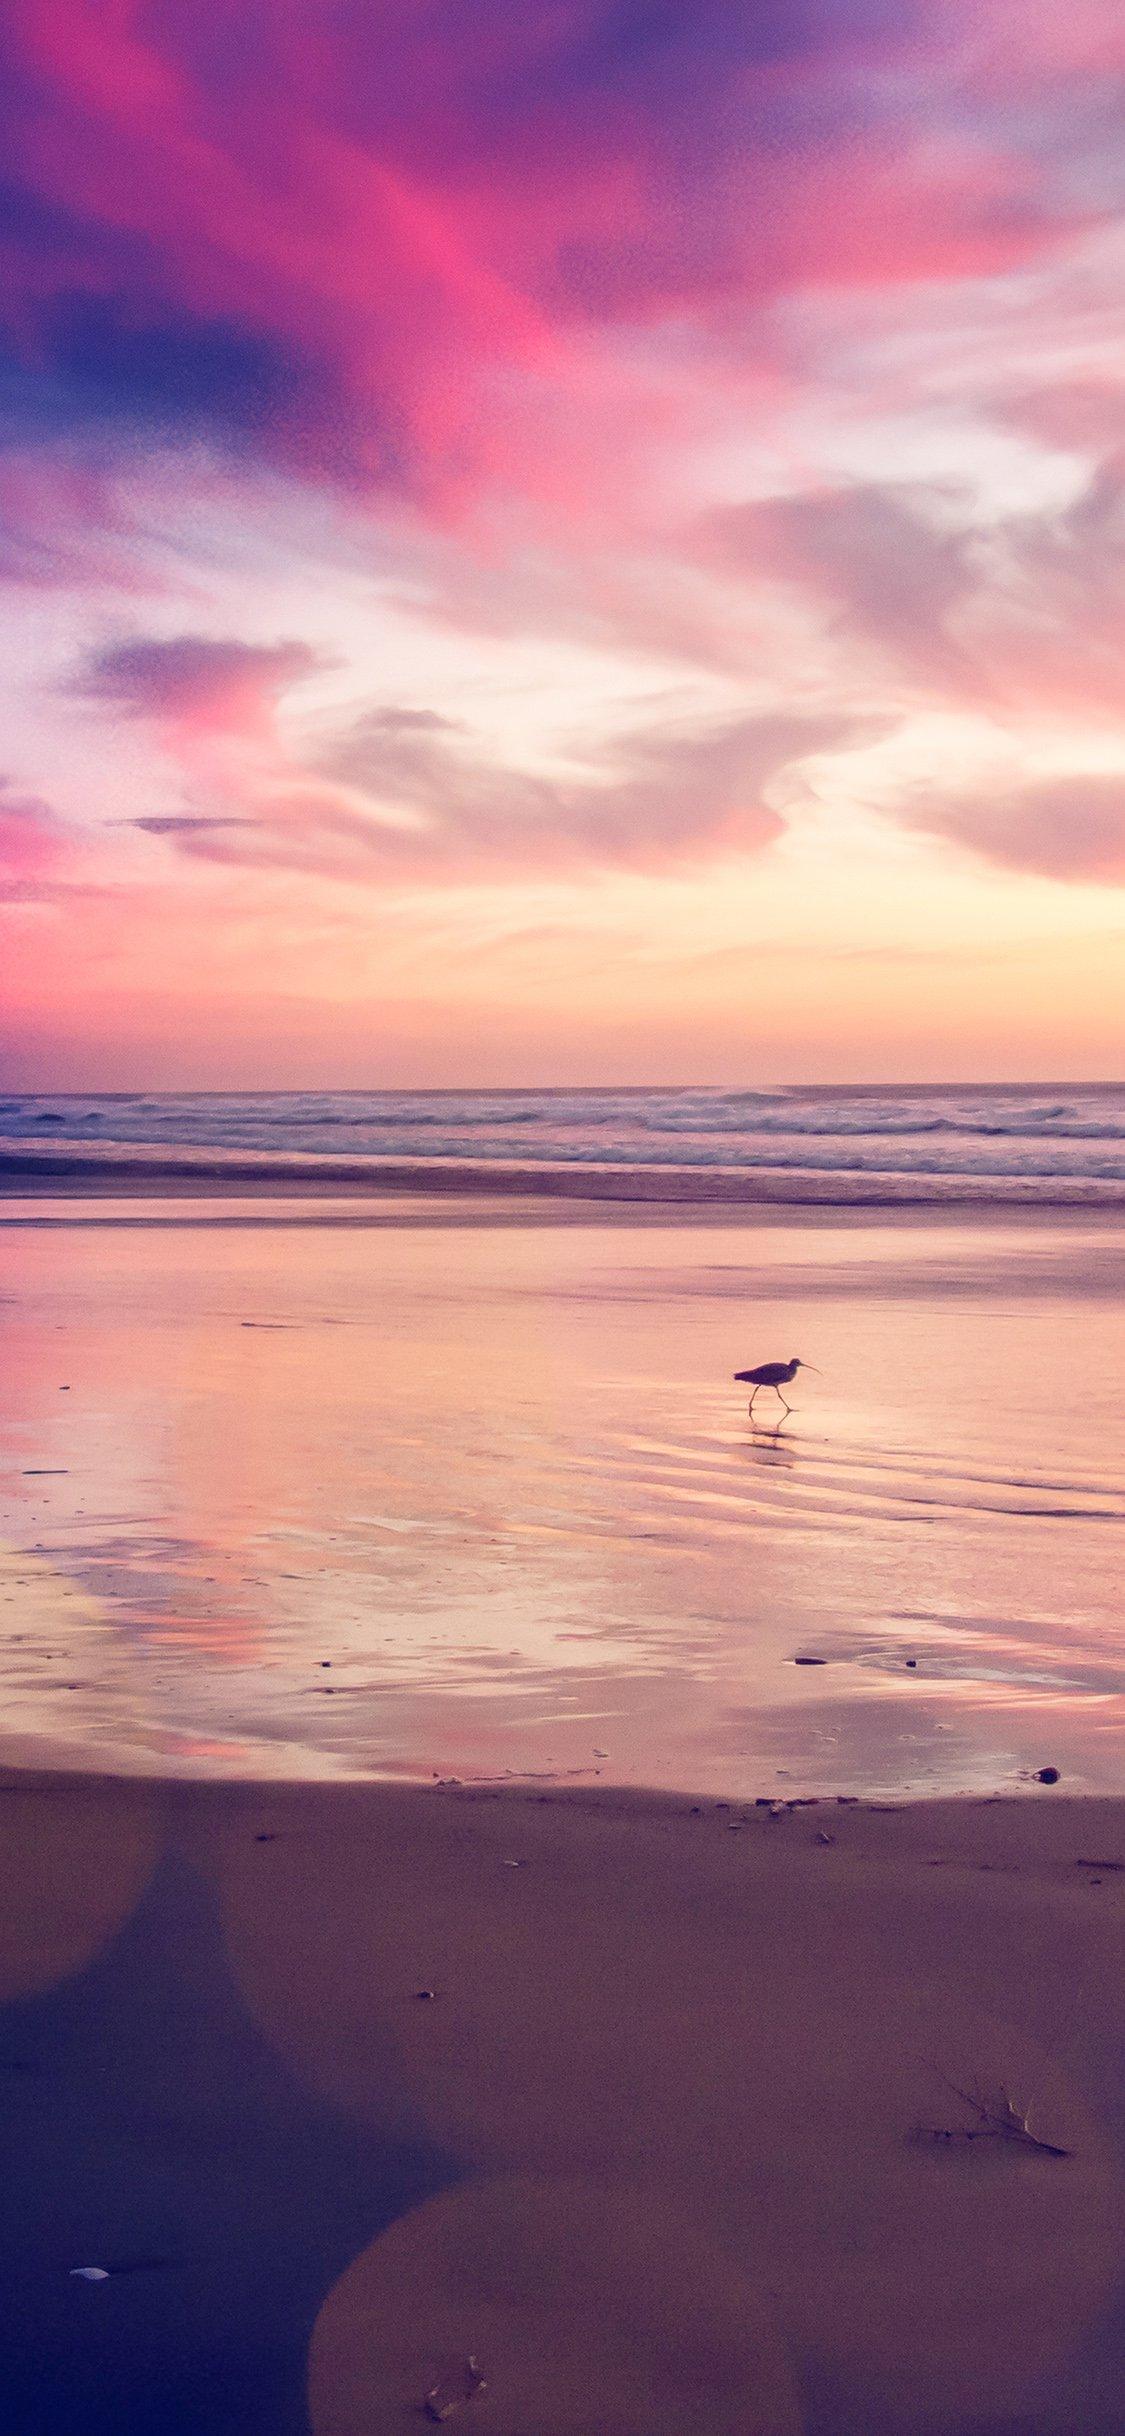 Sunset Beach Bird Iphone X Wallpapers Free Download